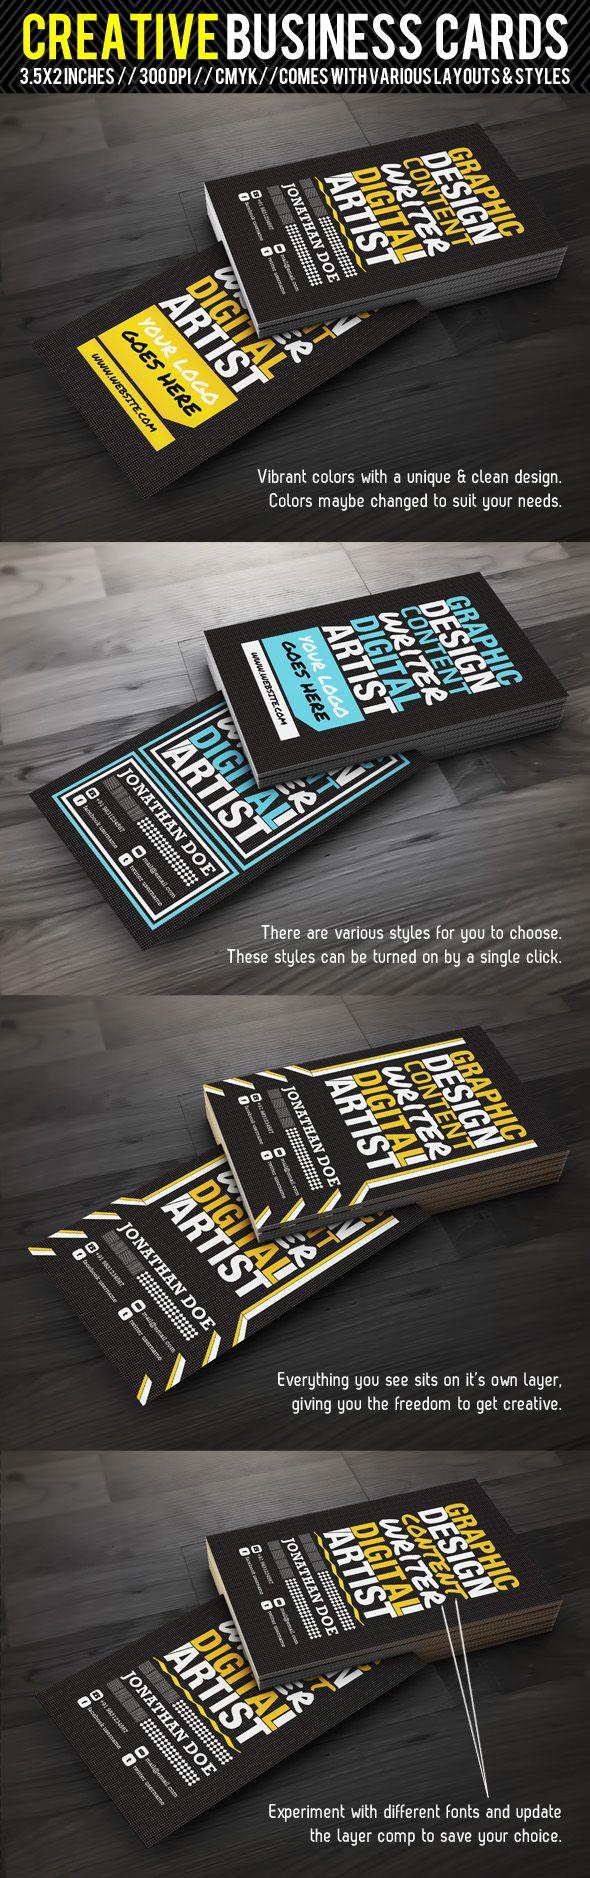 Creative Designer Business Card 2 by ~ShermanJackson on deviantART